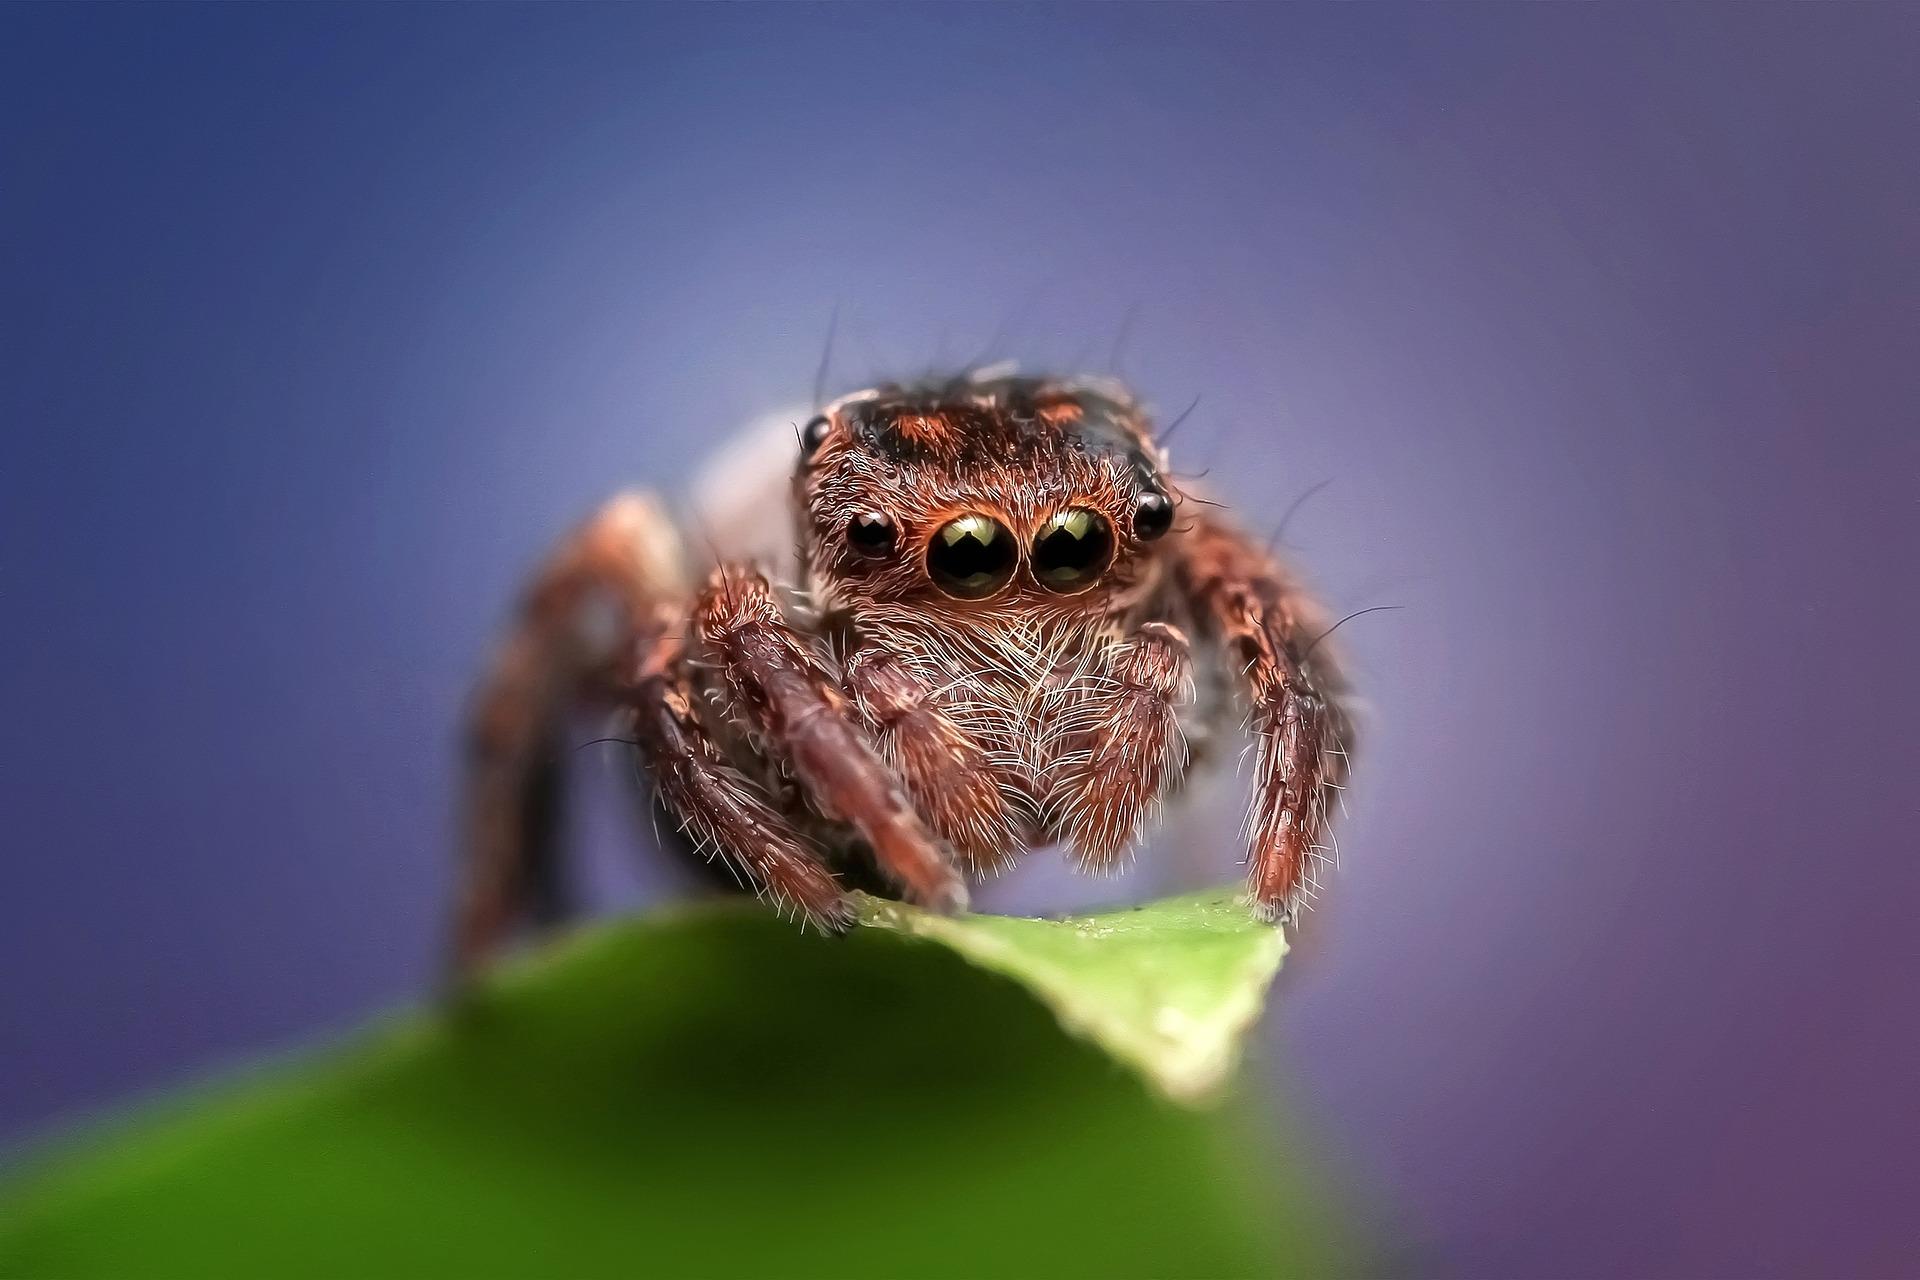 jumping-spider-1183412_1920